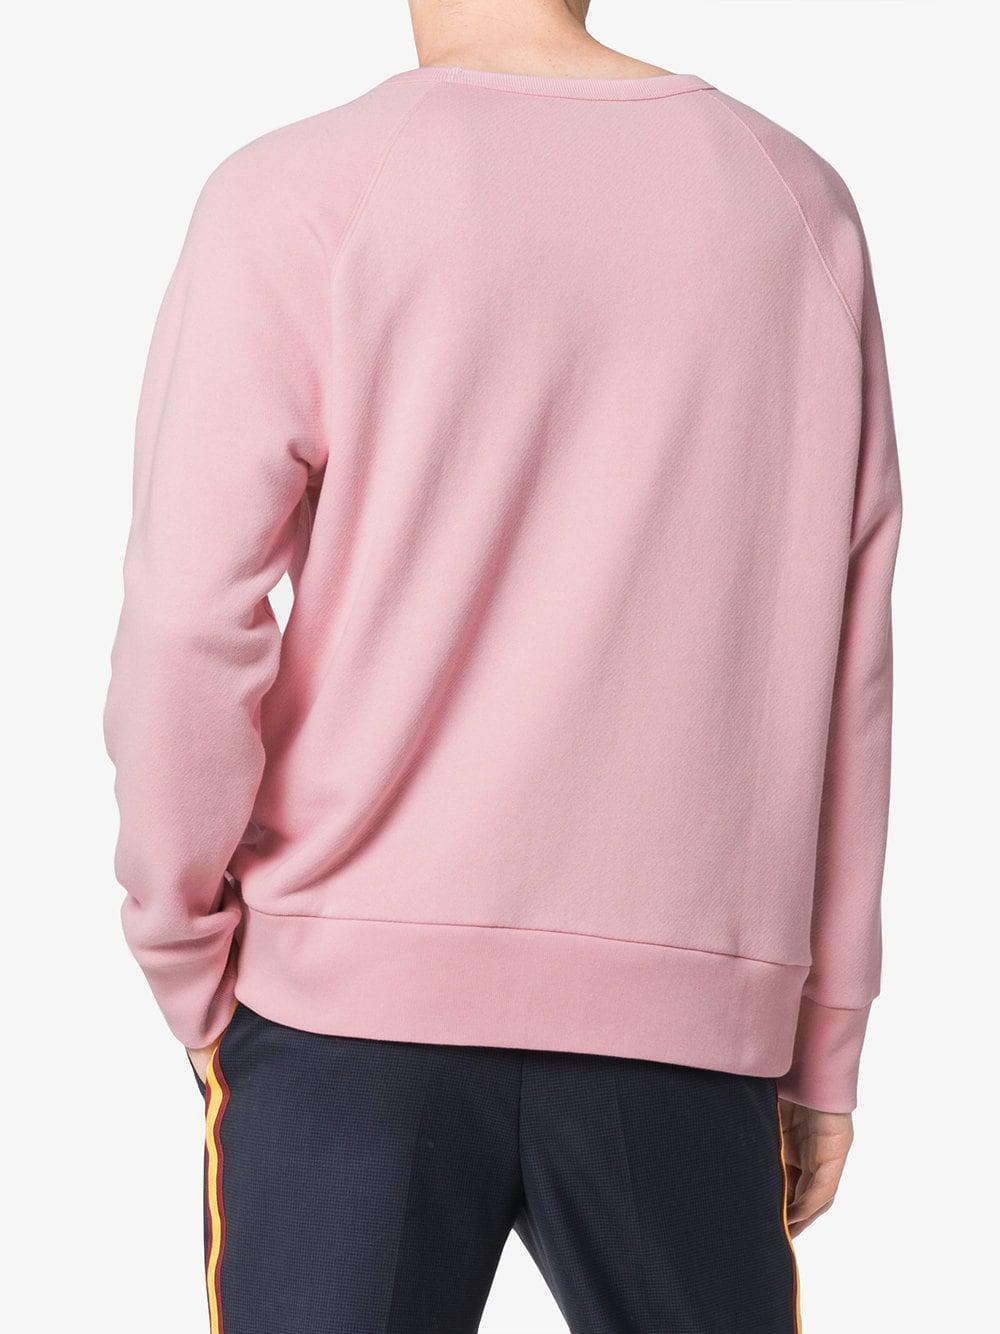 7ef732402 Gucci Baby Print Logo Long Sleeve Sweatshirt in Pink for Men - Lyst